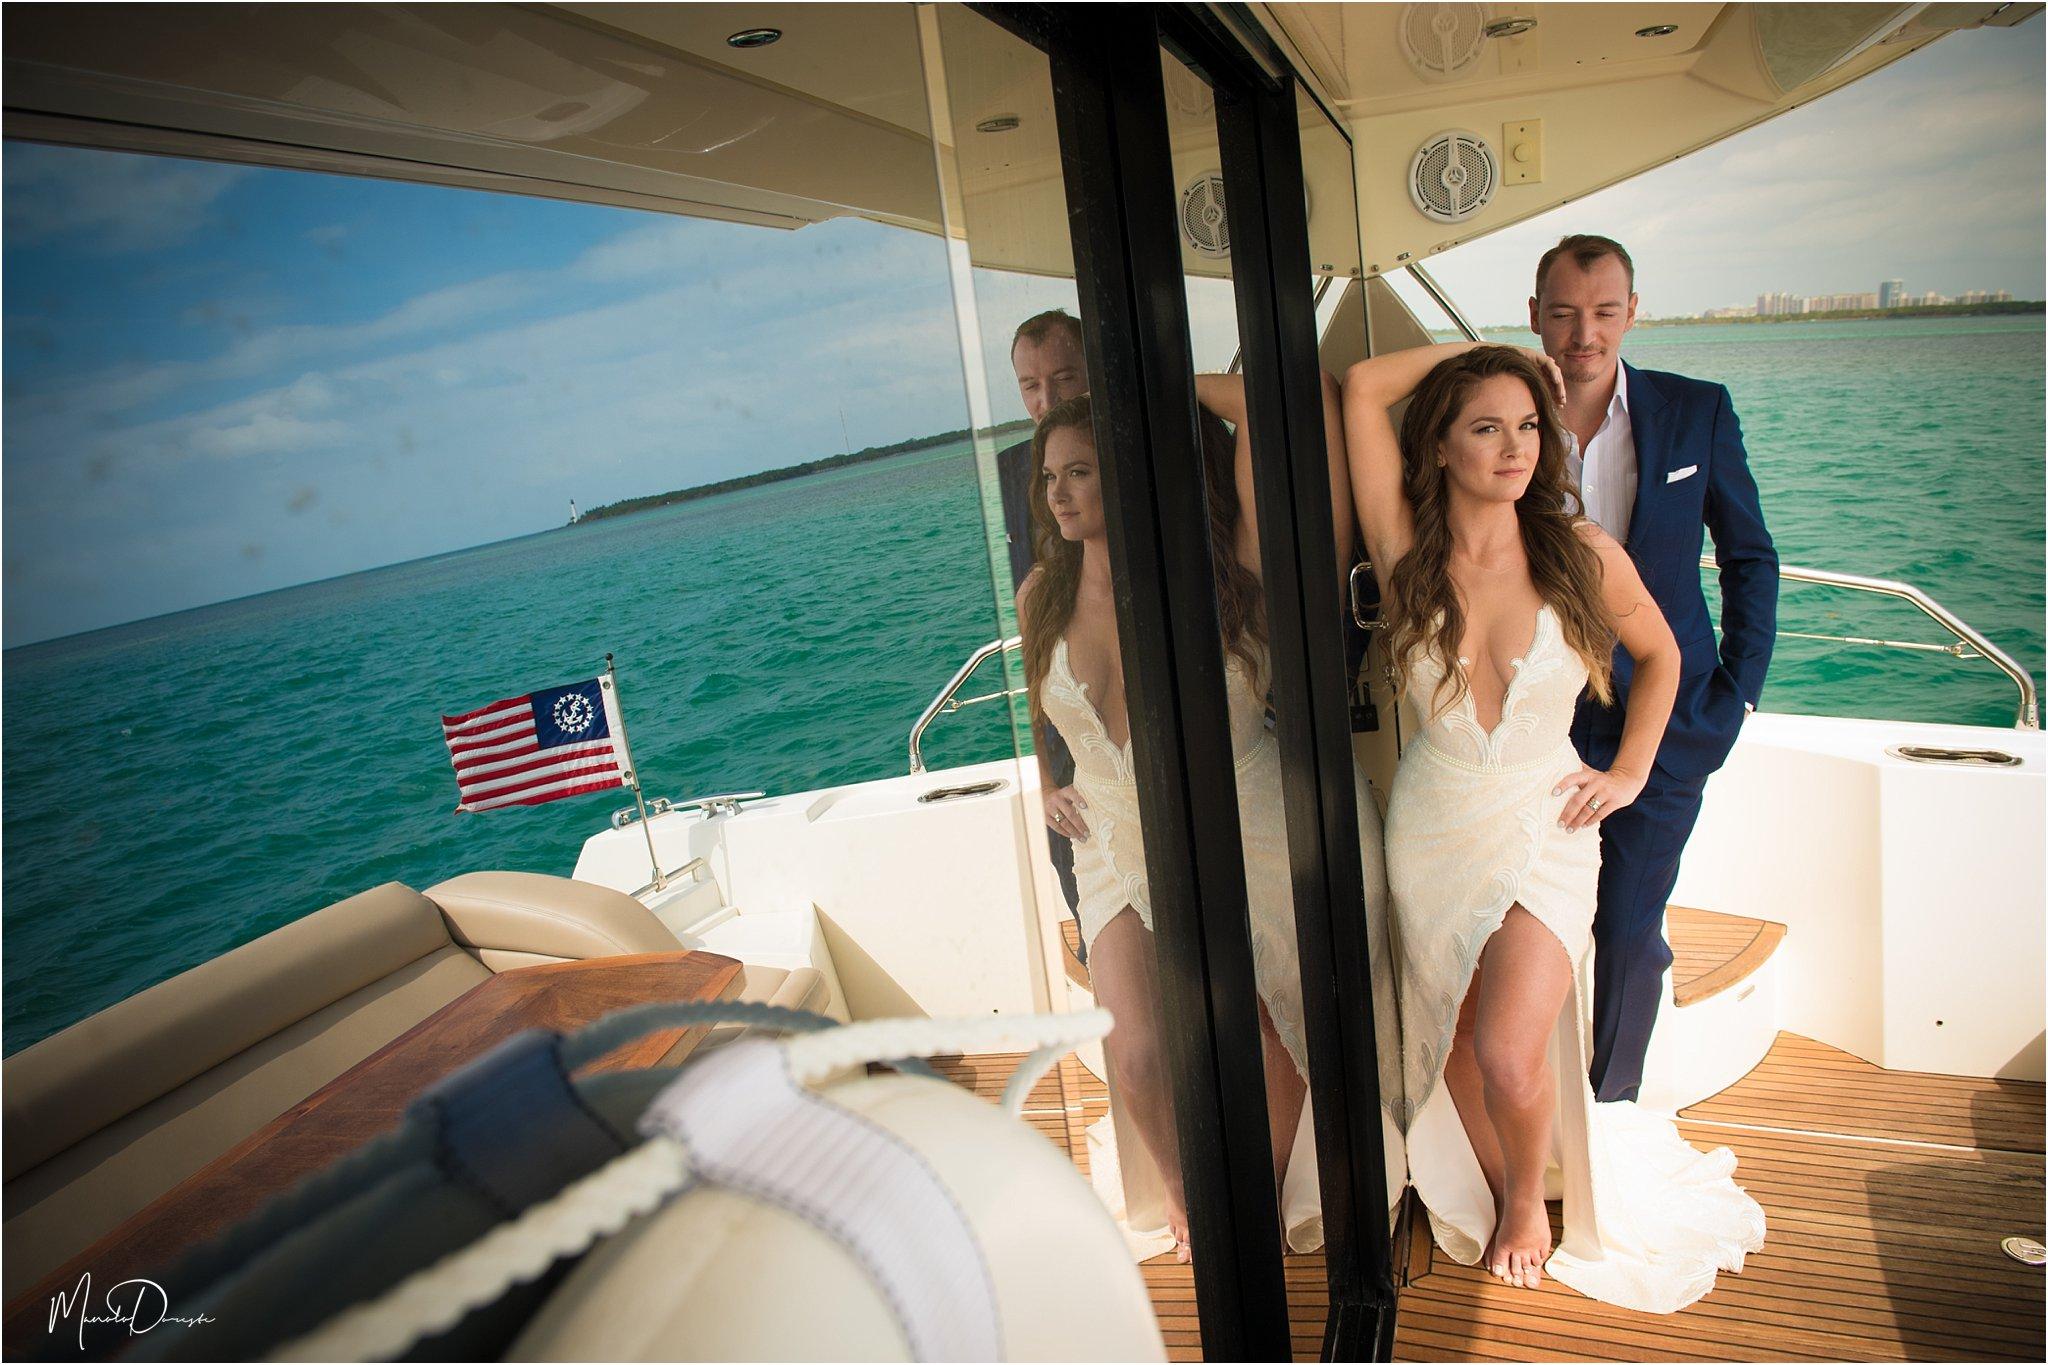 00892_ManoloDoreste_InFocusStudios_Wedding_Family_Photography_Miami_MiamiPhotographer.jpg